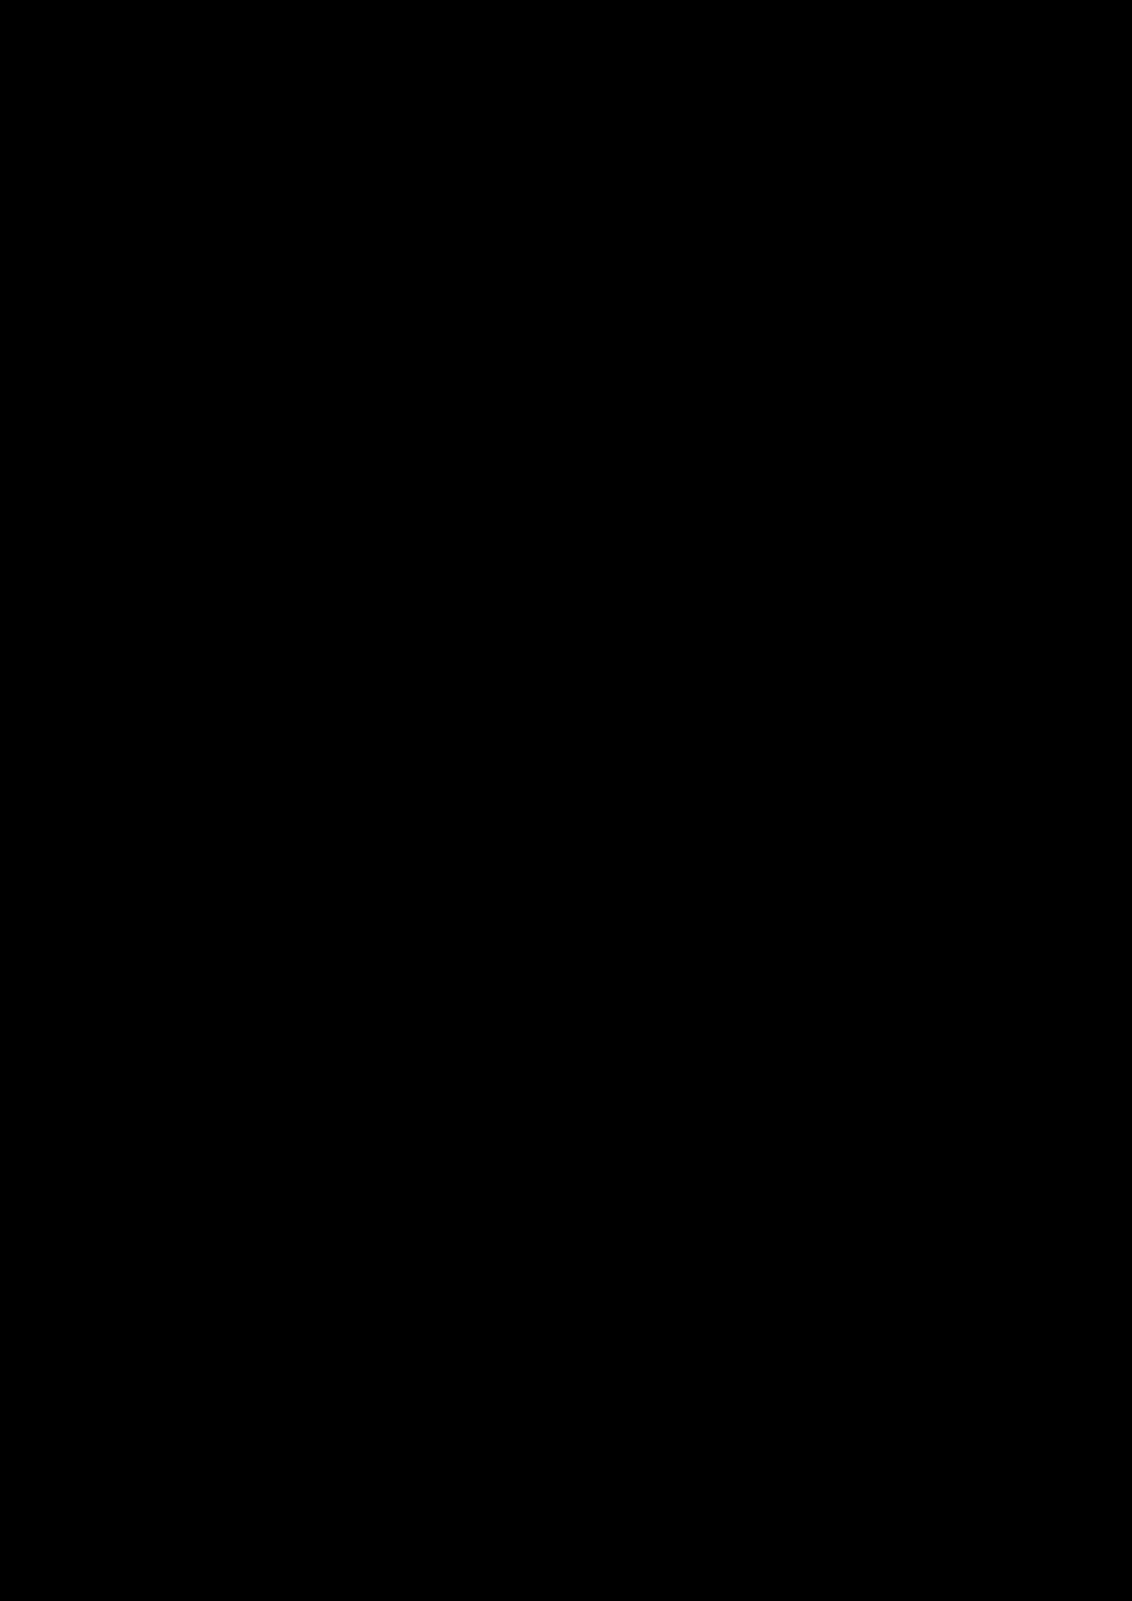 Ispoved Pervogo Boga slide, Image 76